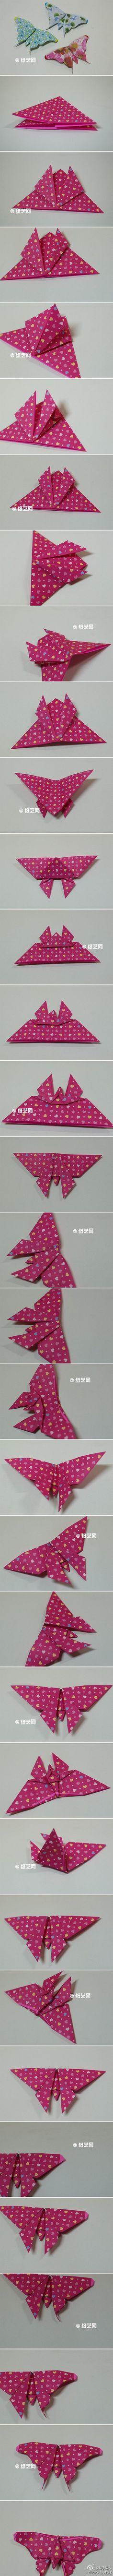 Handmade DIY origami paper cutting handmade paper art origami butterfly